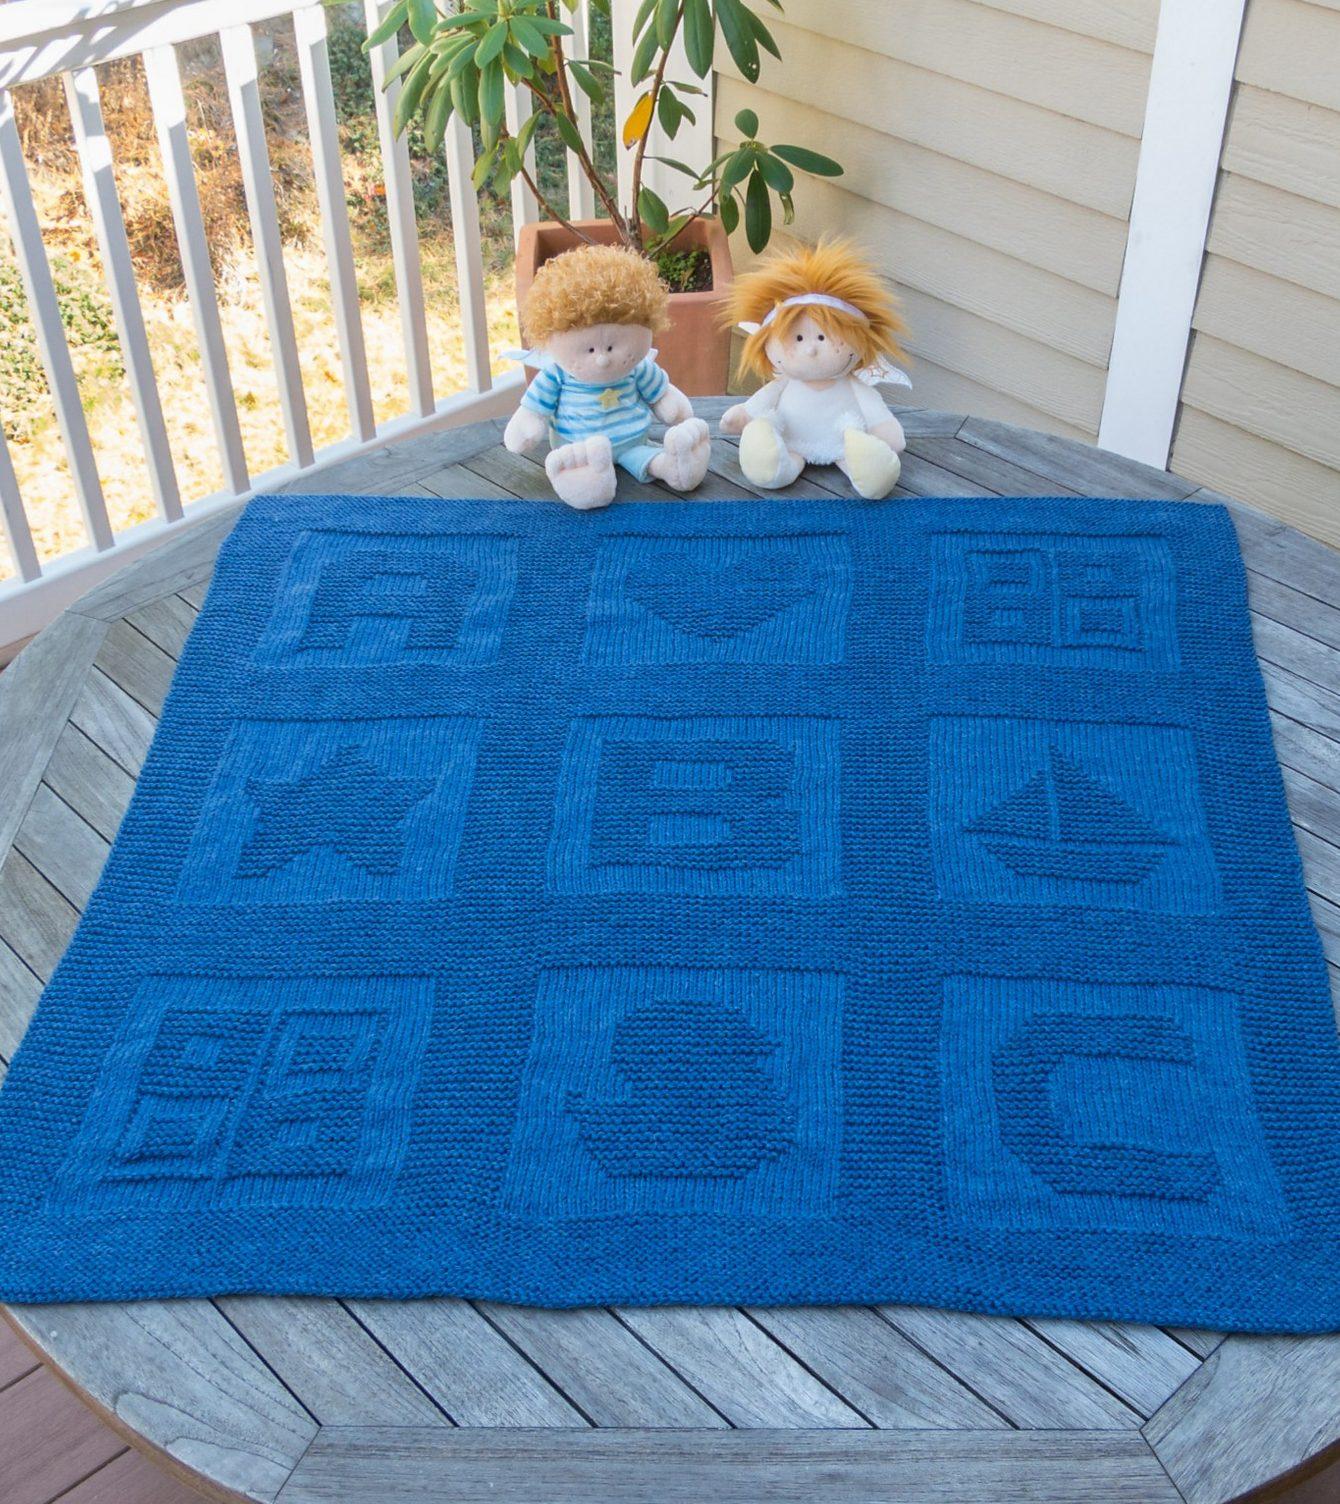 Baby Blanket Knitting Patterns free knitting pattern for abc baby blanket jivgeen